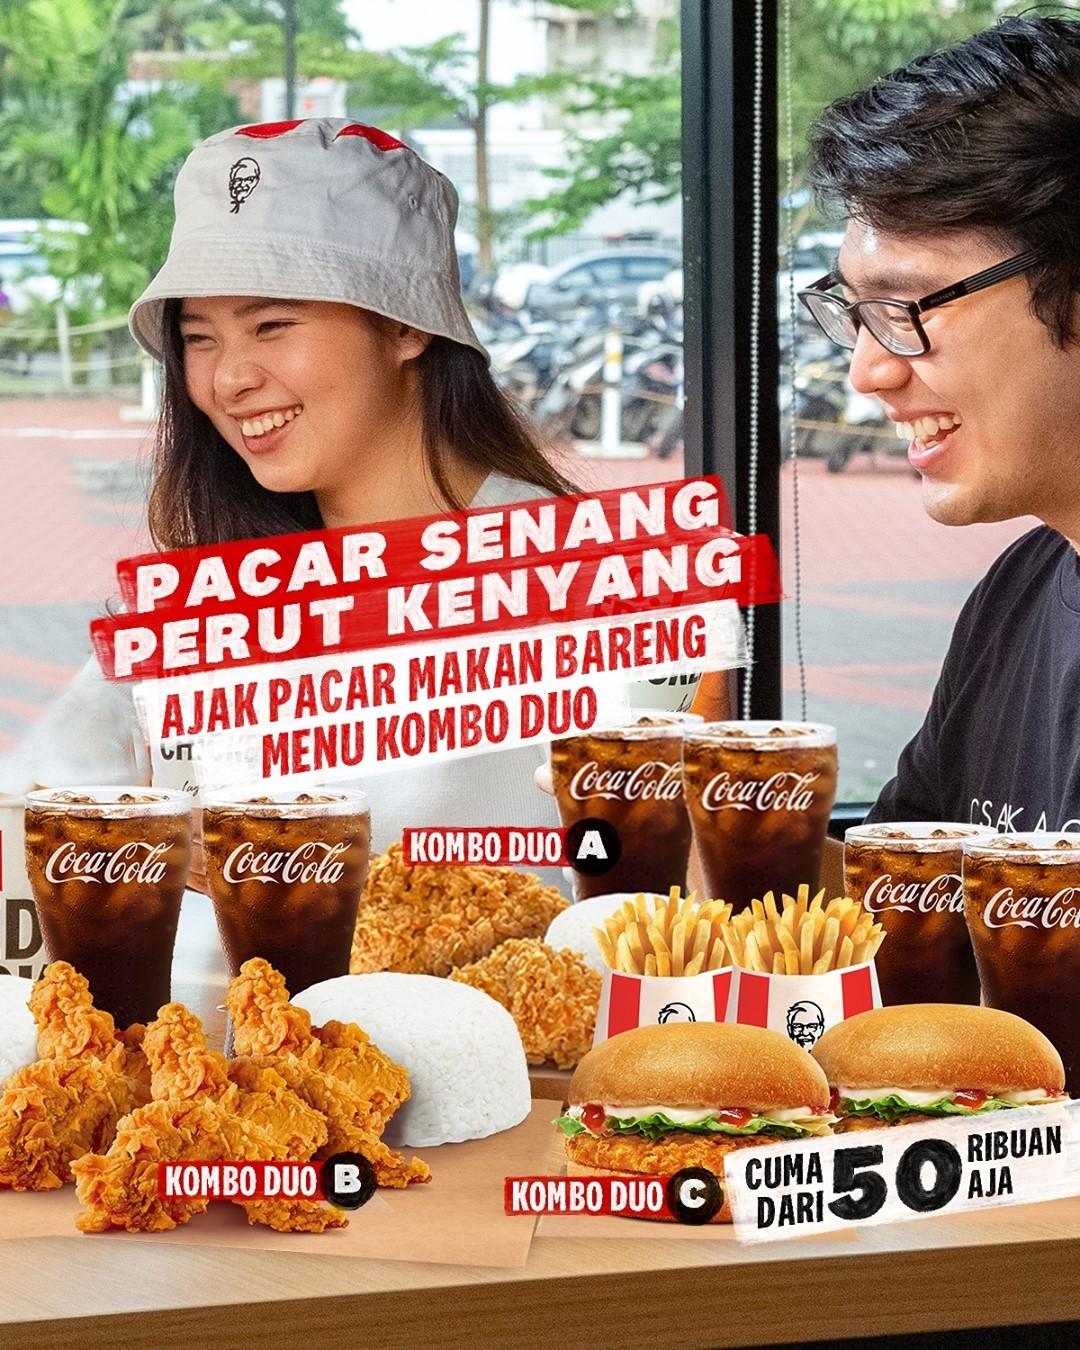 Promo KFC KOMBO DUO harga mulai dari Rp. 45.455